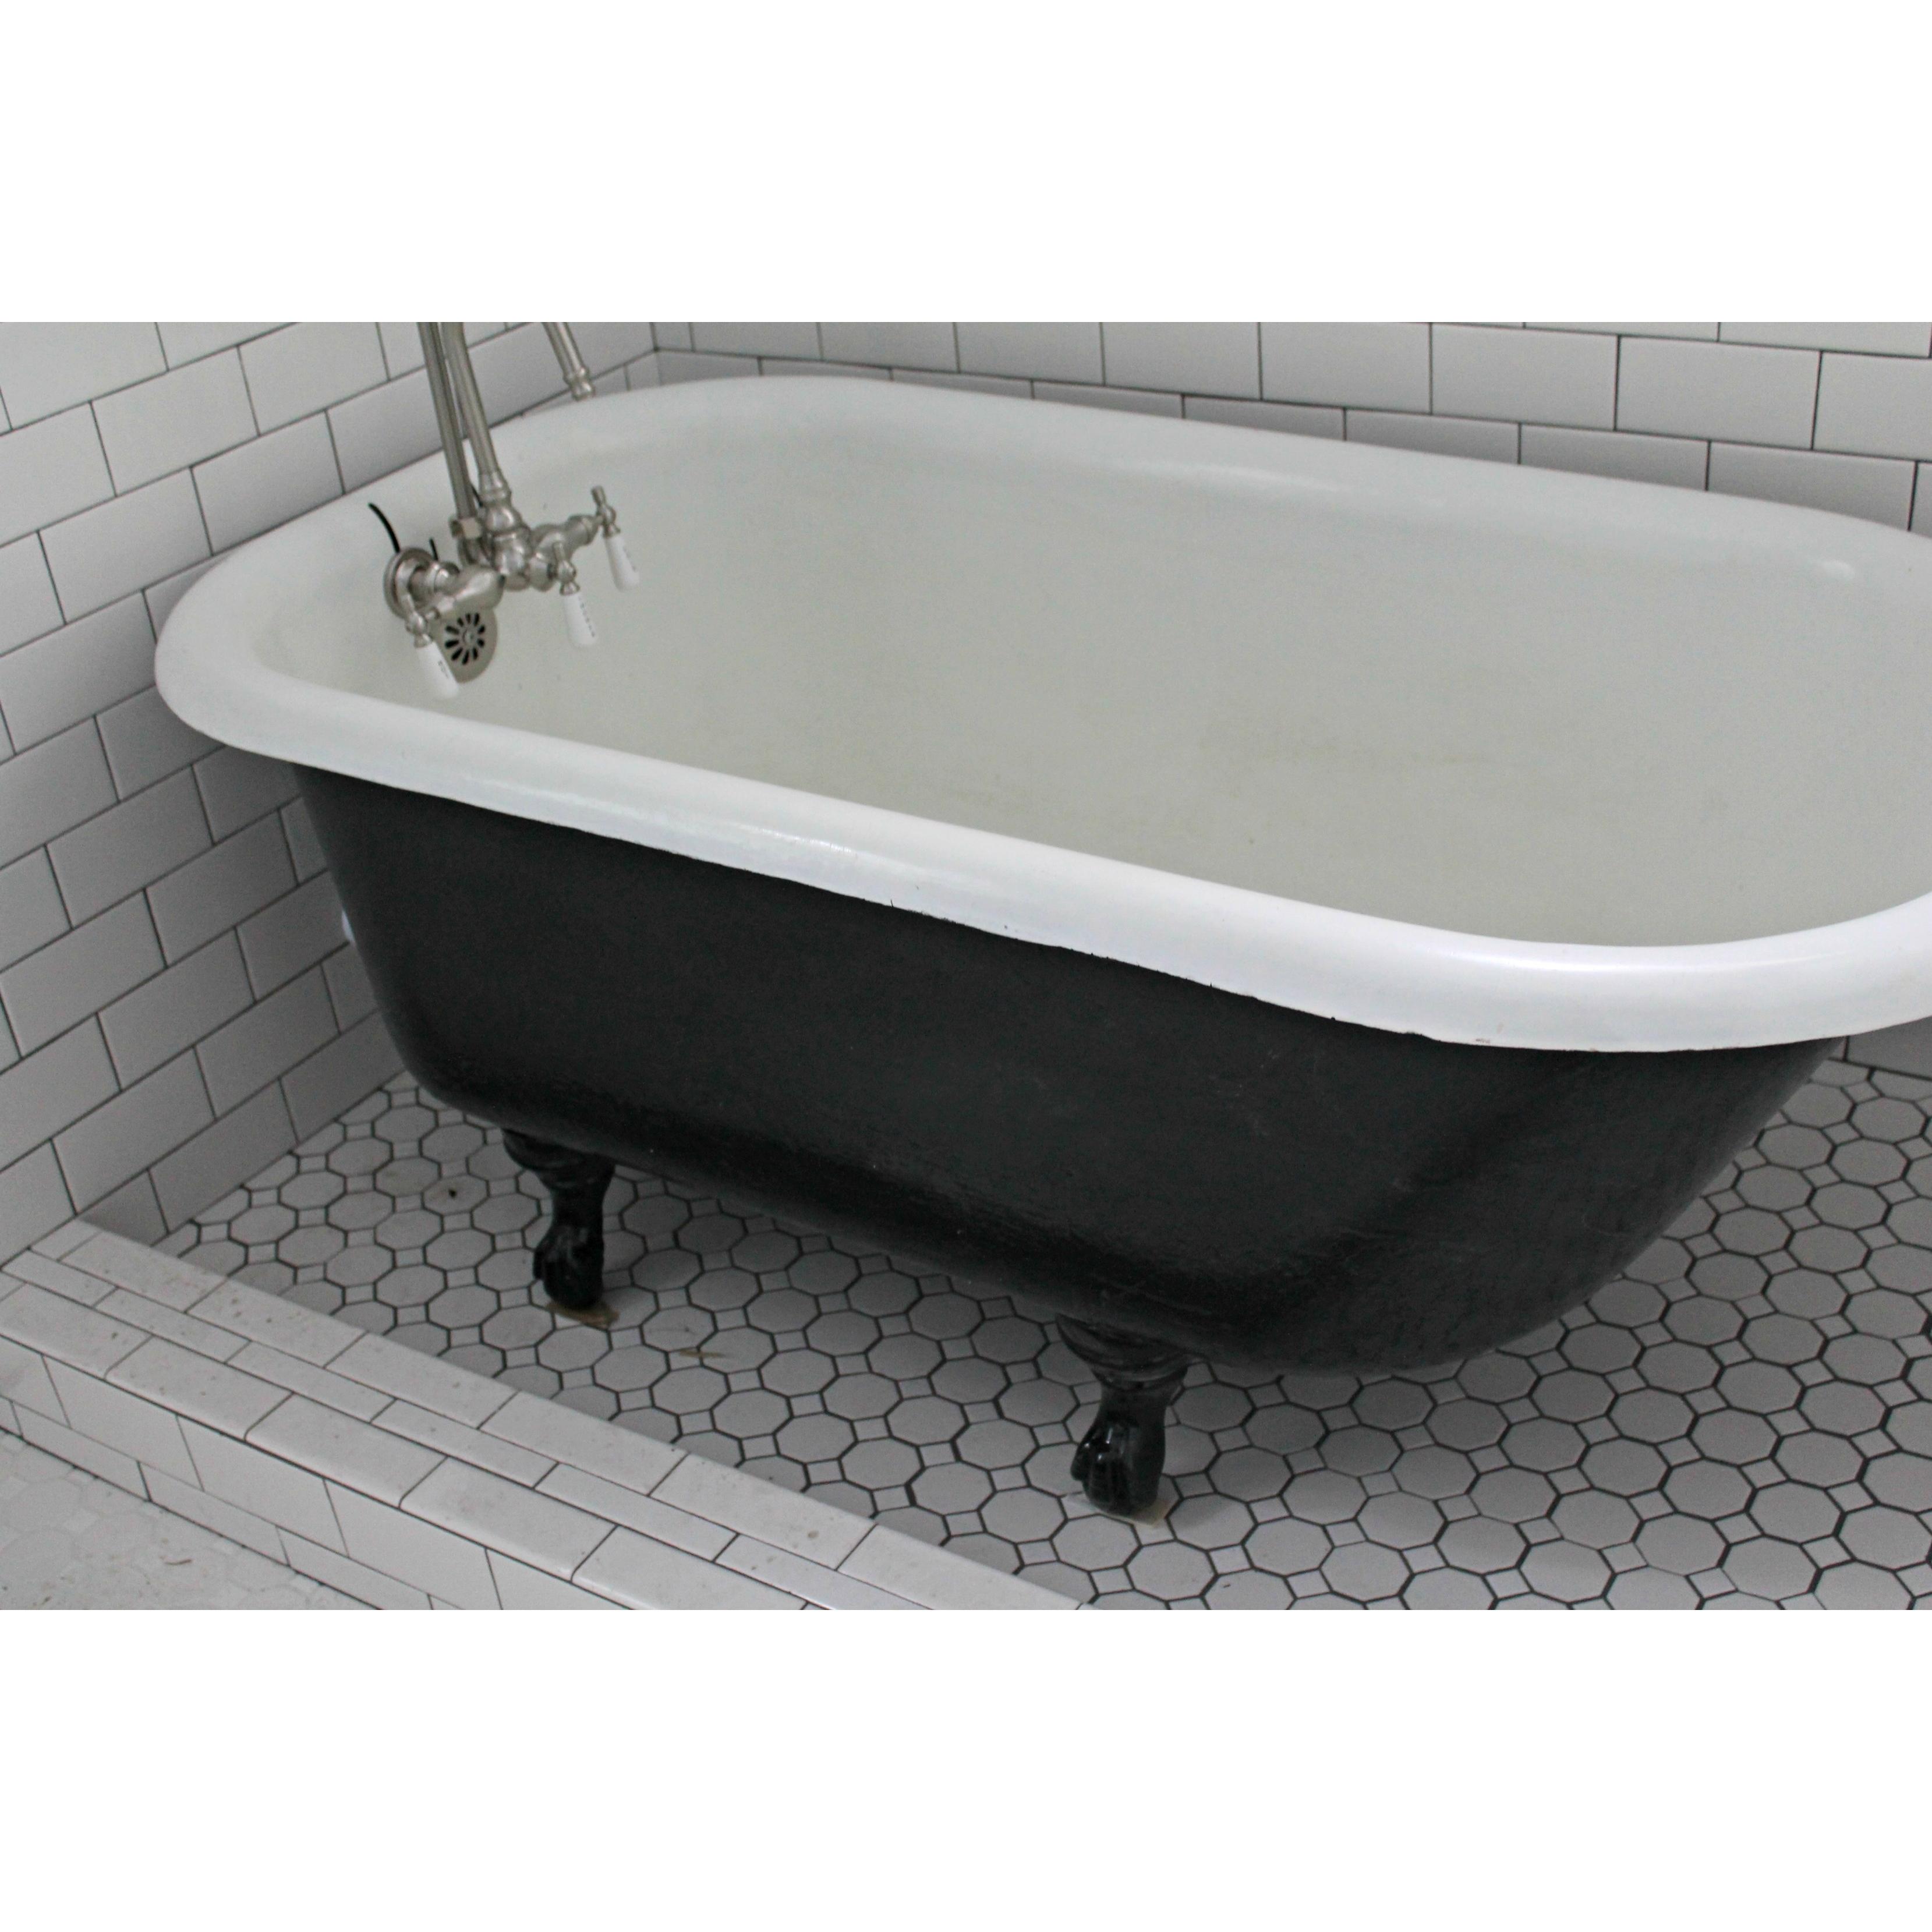 Bathtub People LLC - Miami Beach, FL - Bathroom & Shower Fixtures